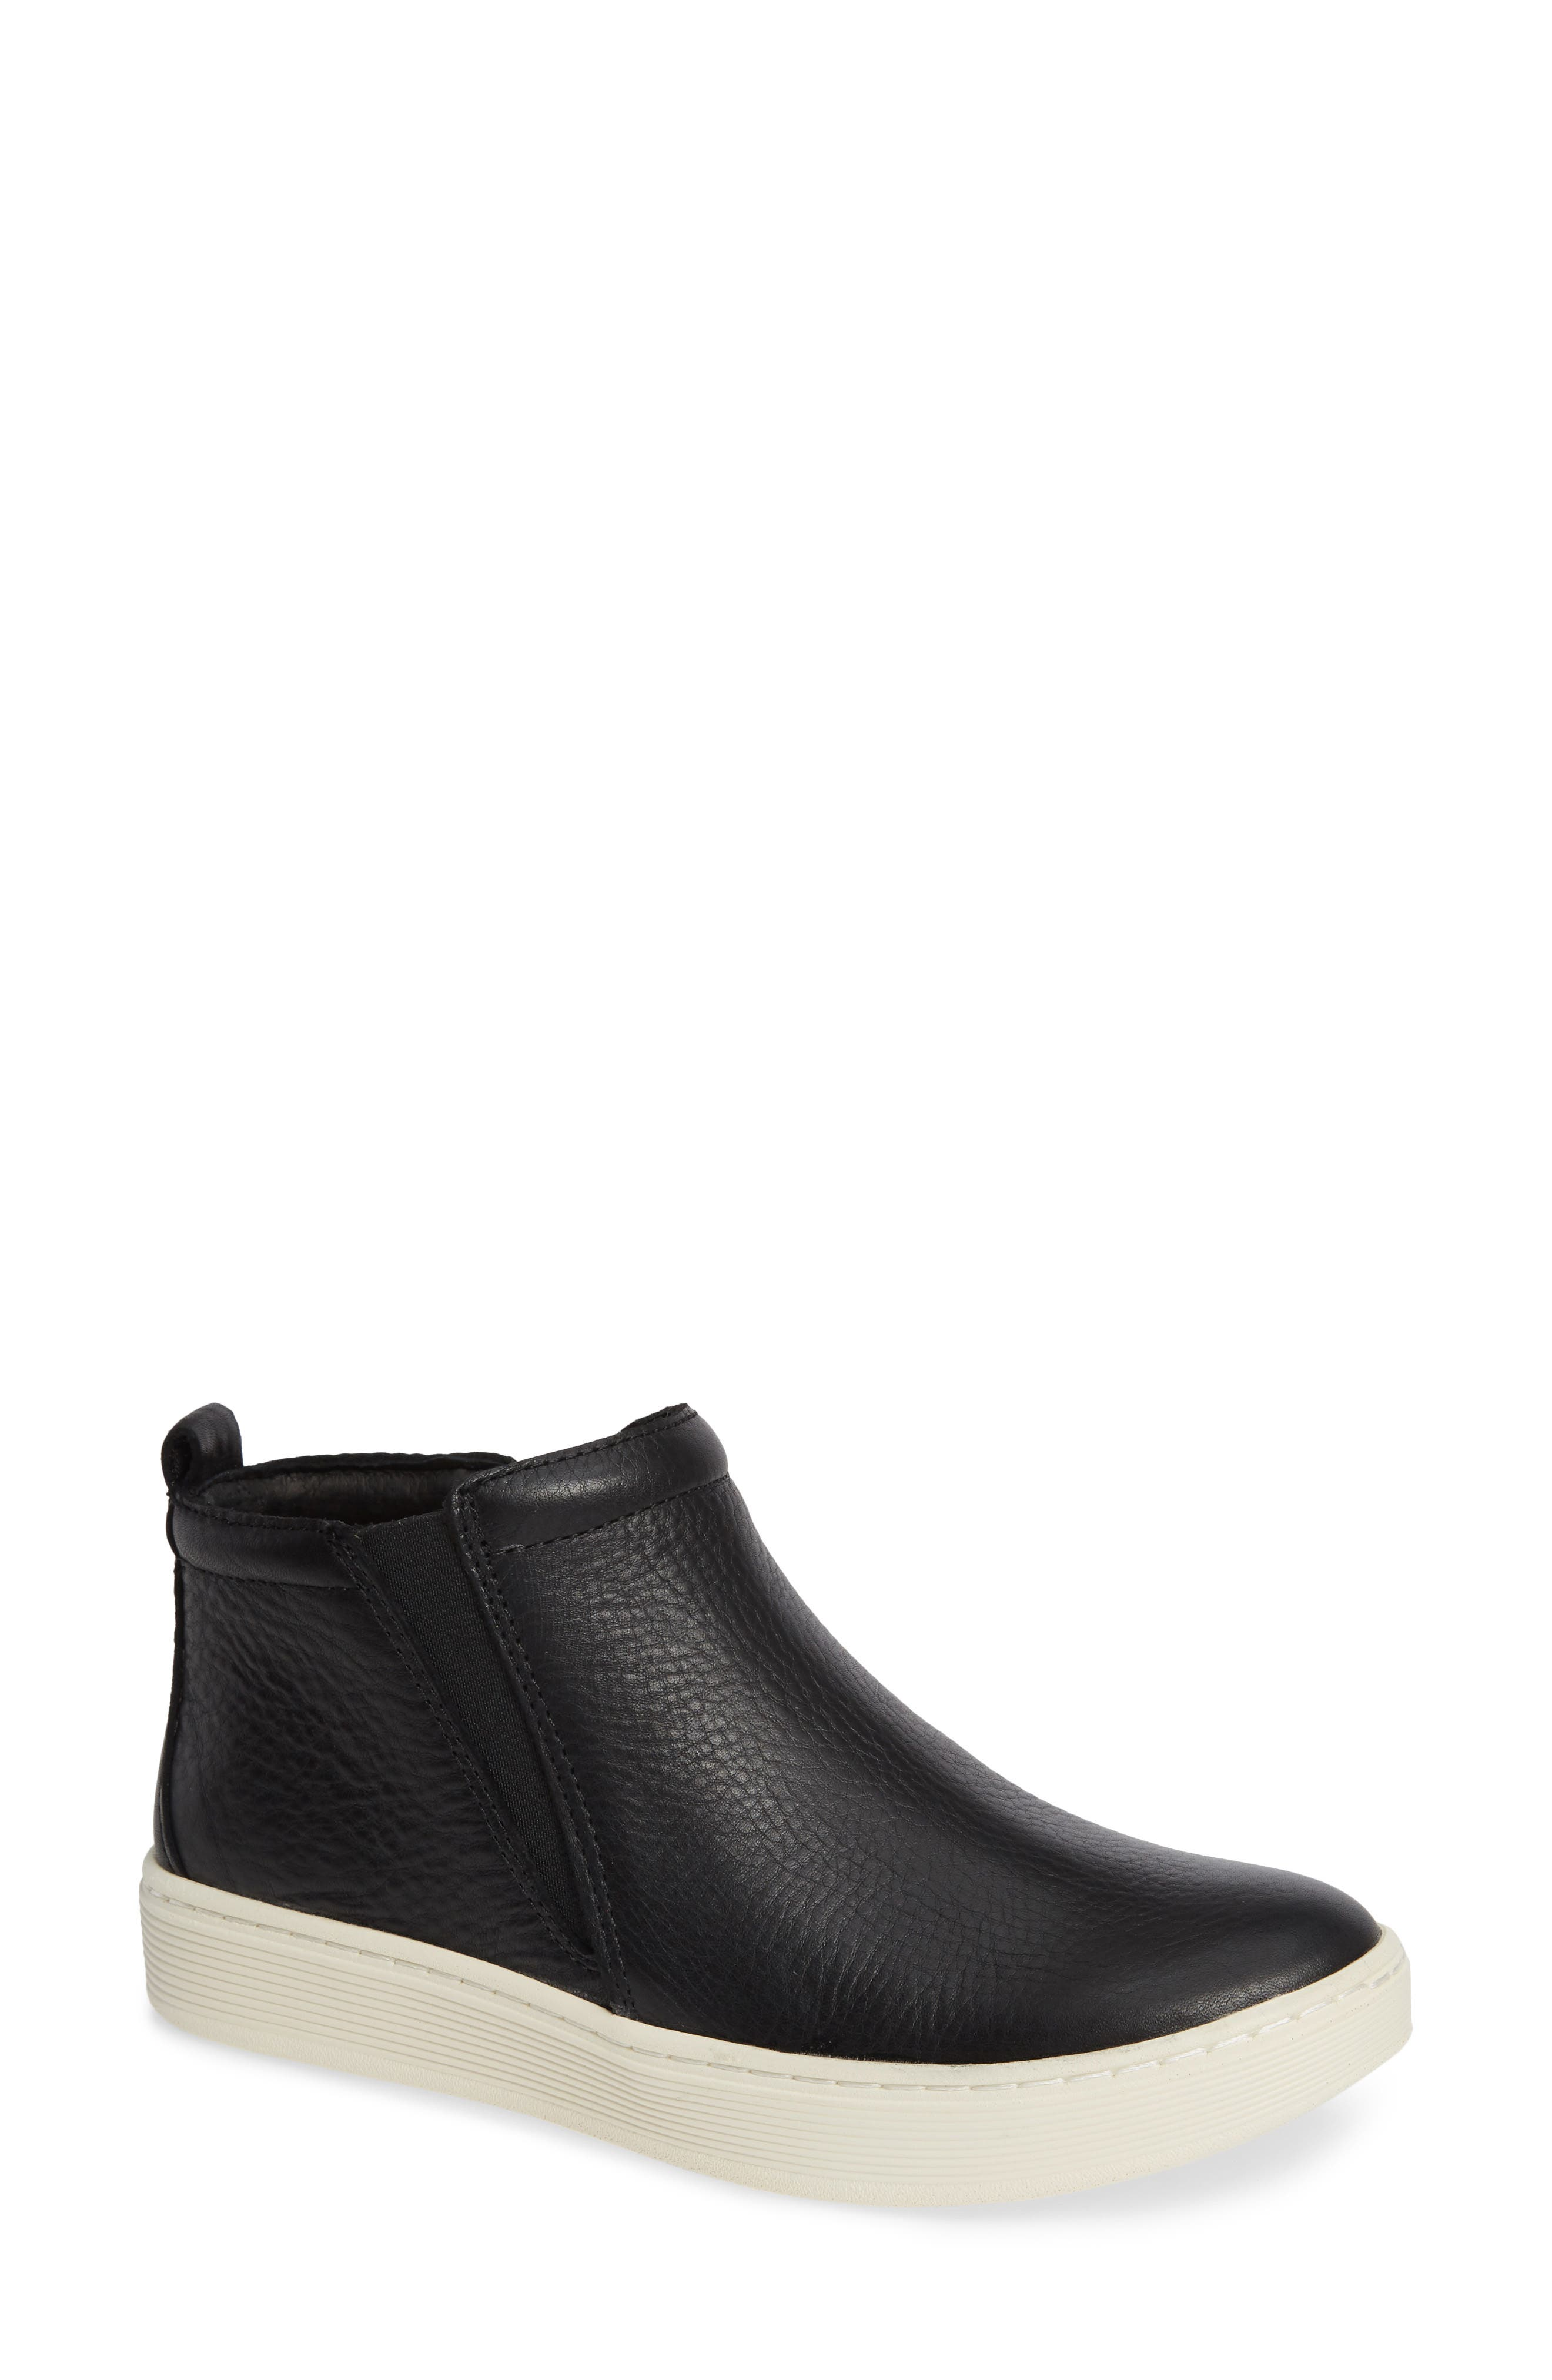 Britton II Waterproof Sneaker Bootie,                             Main thumbnail 1, color,                             BLACK LEATHER